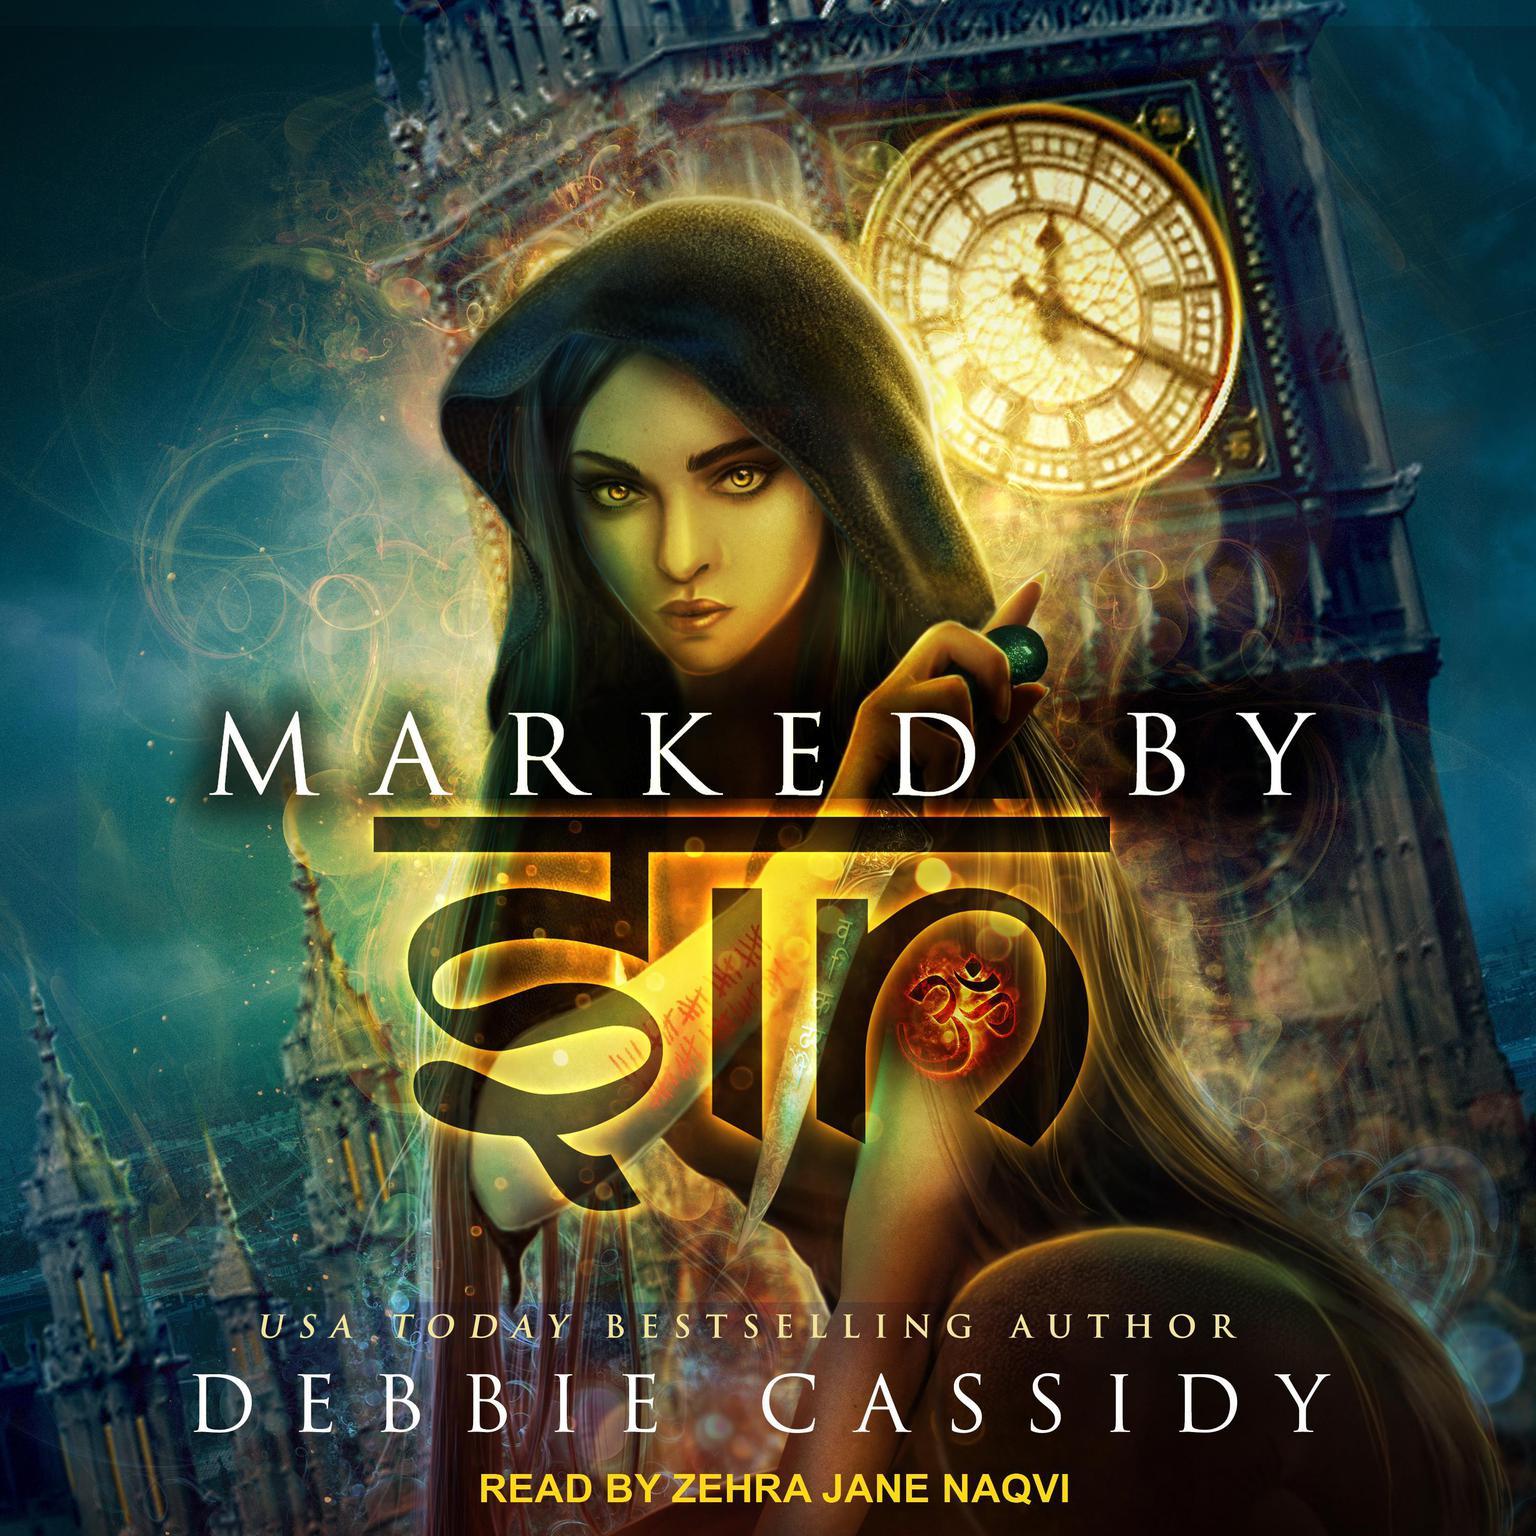 Marked by Sin: An Urban Fantasy Novel Audiobook, by Jasmine Walt